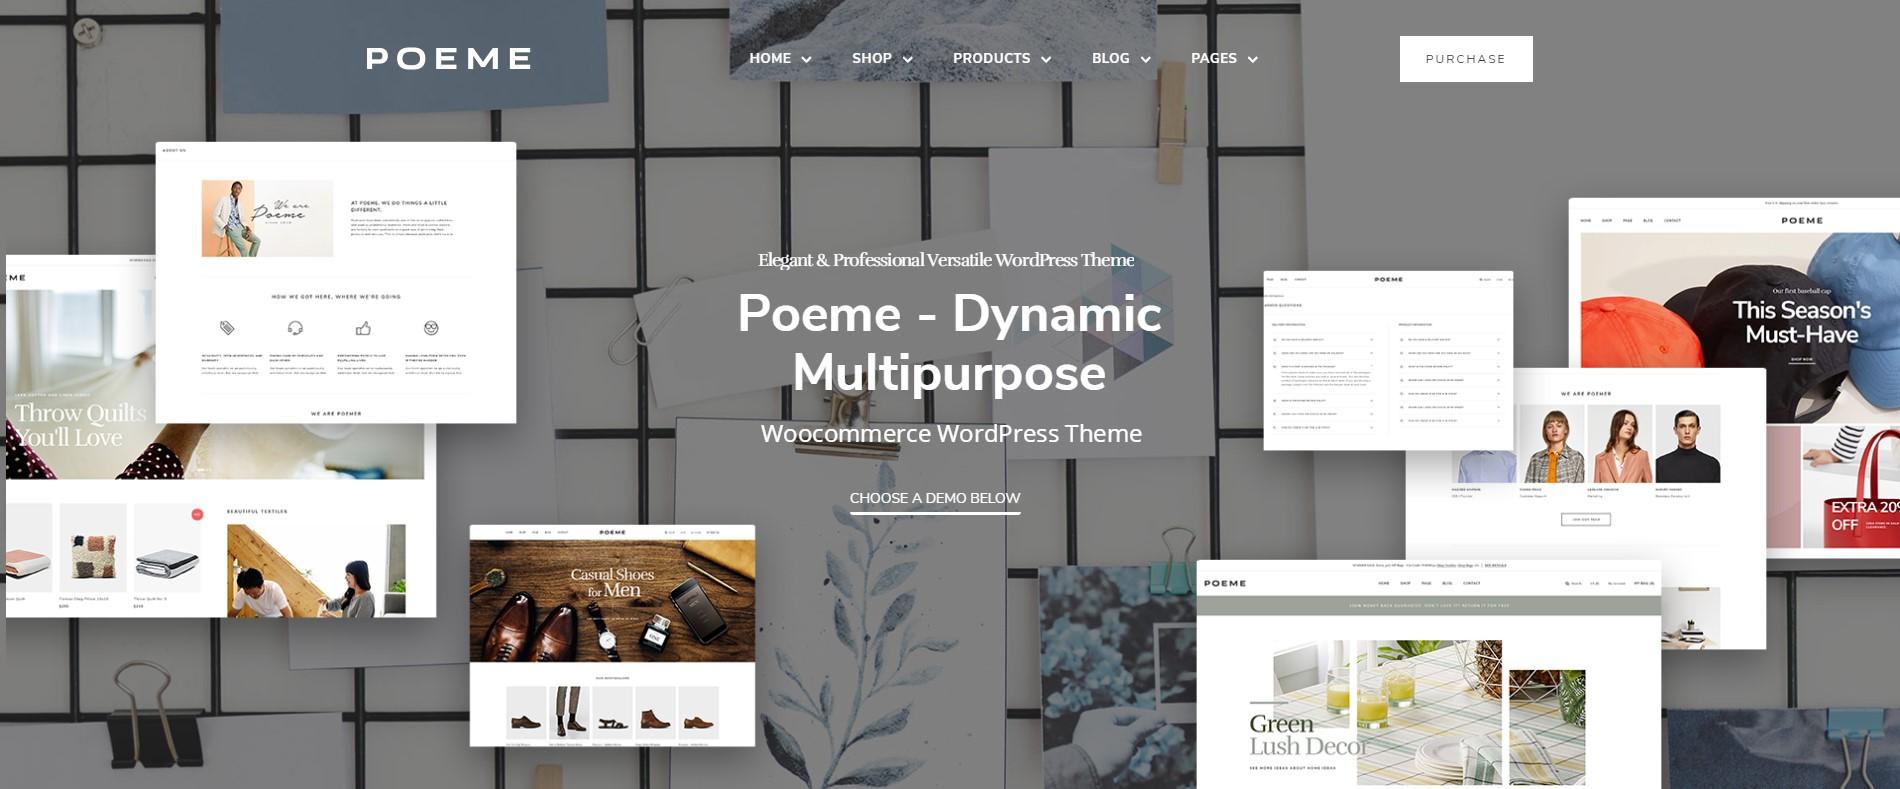 Poeme - Dynamic Multipurpose WooCommerce WordPress Theme